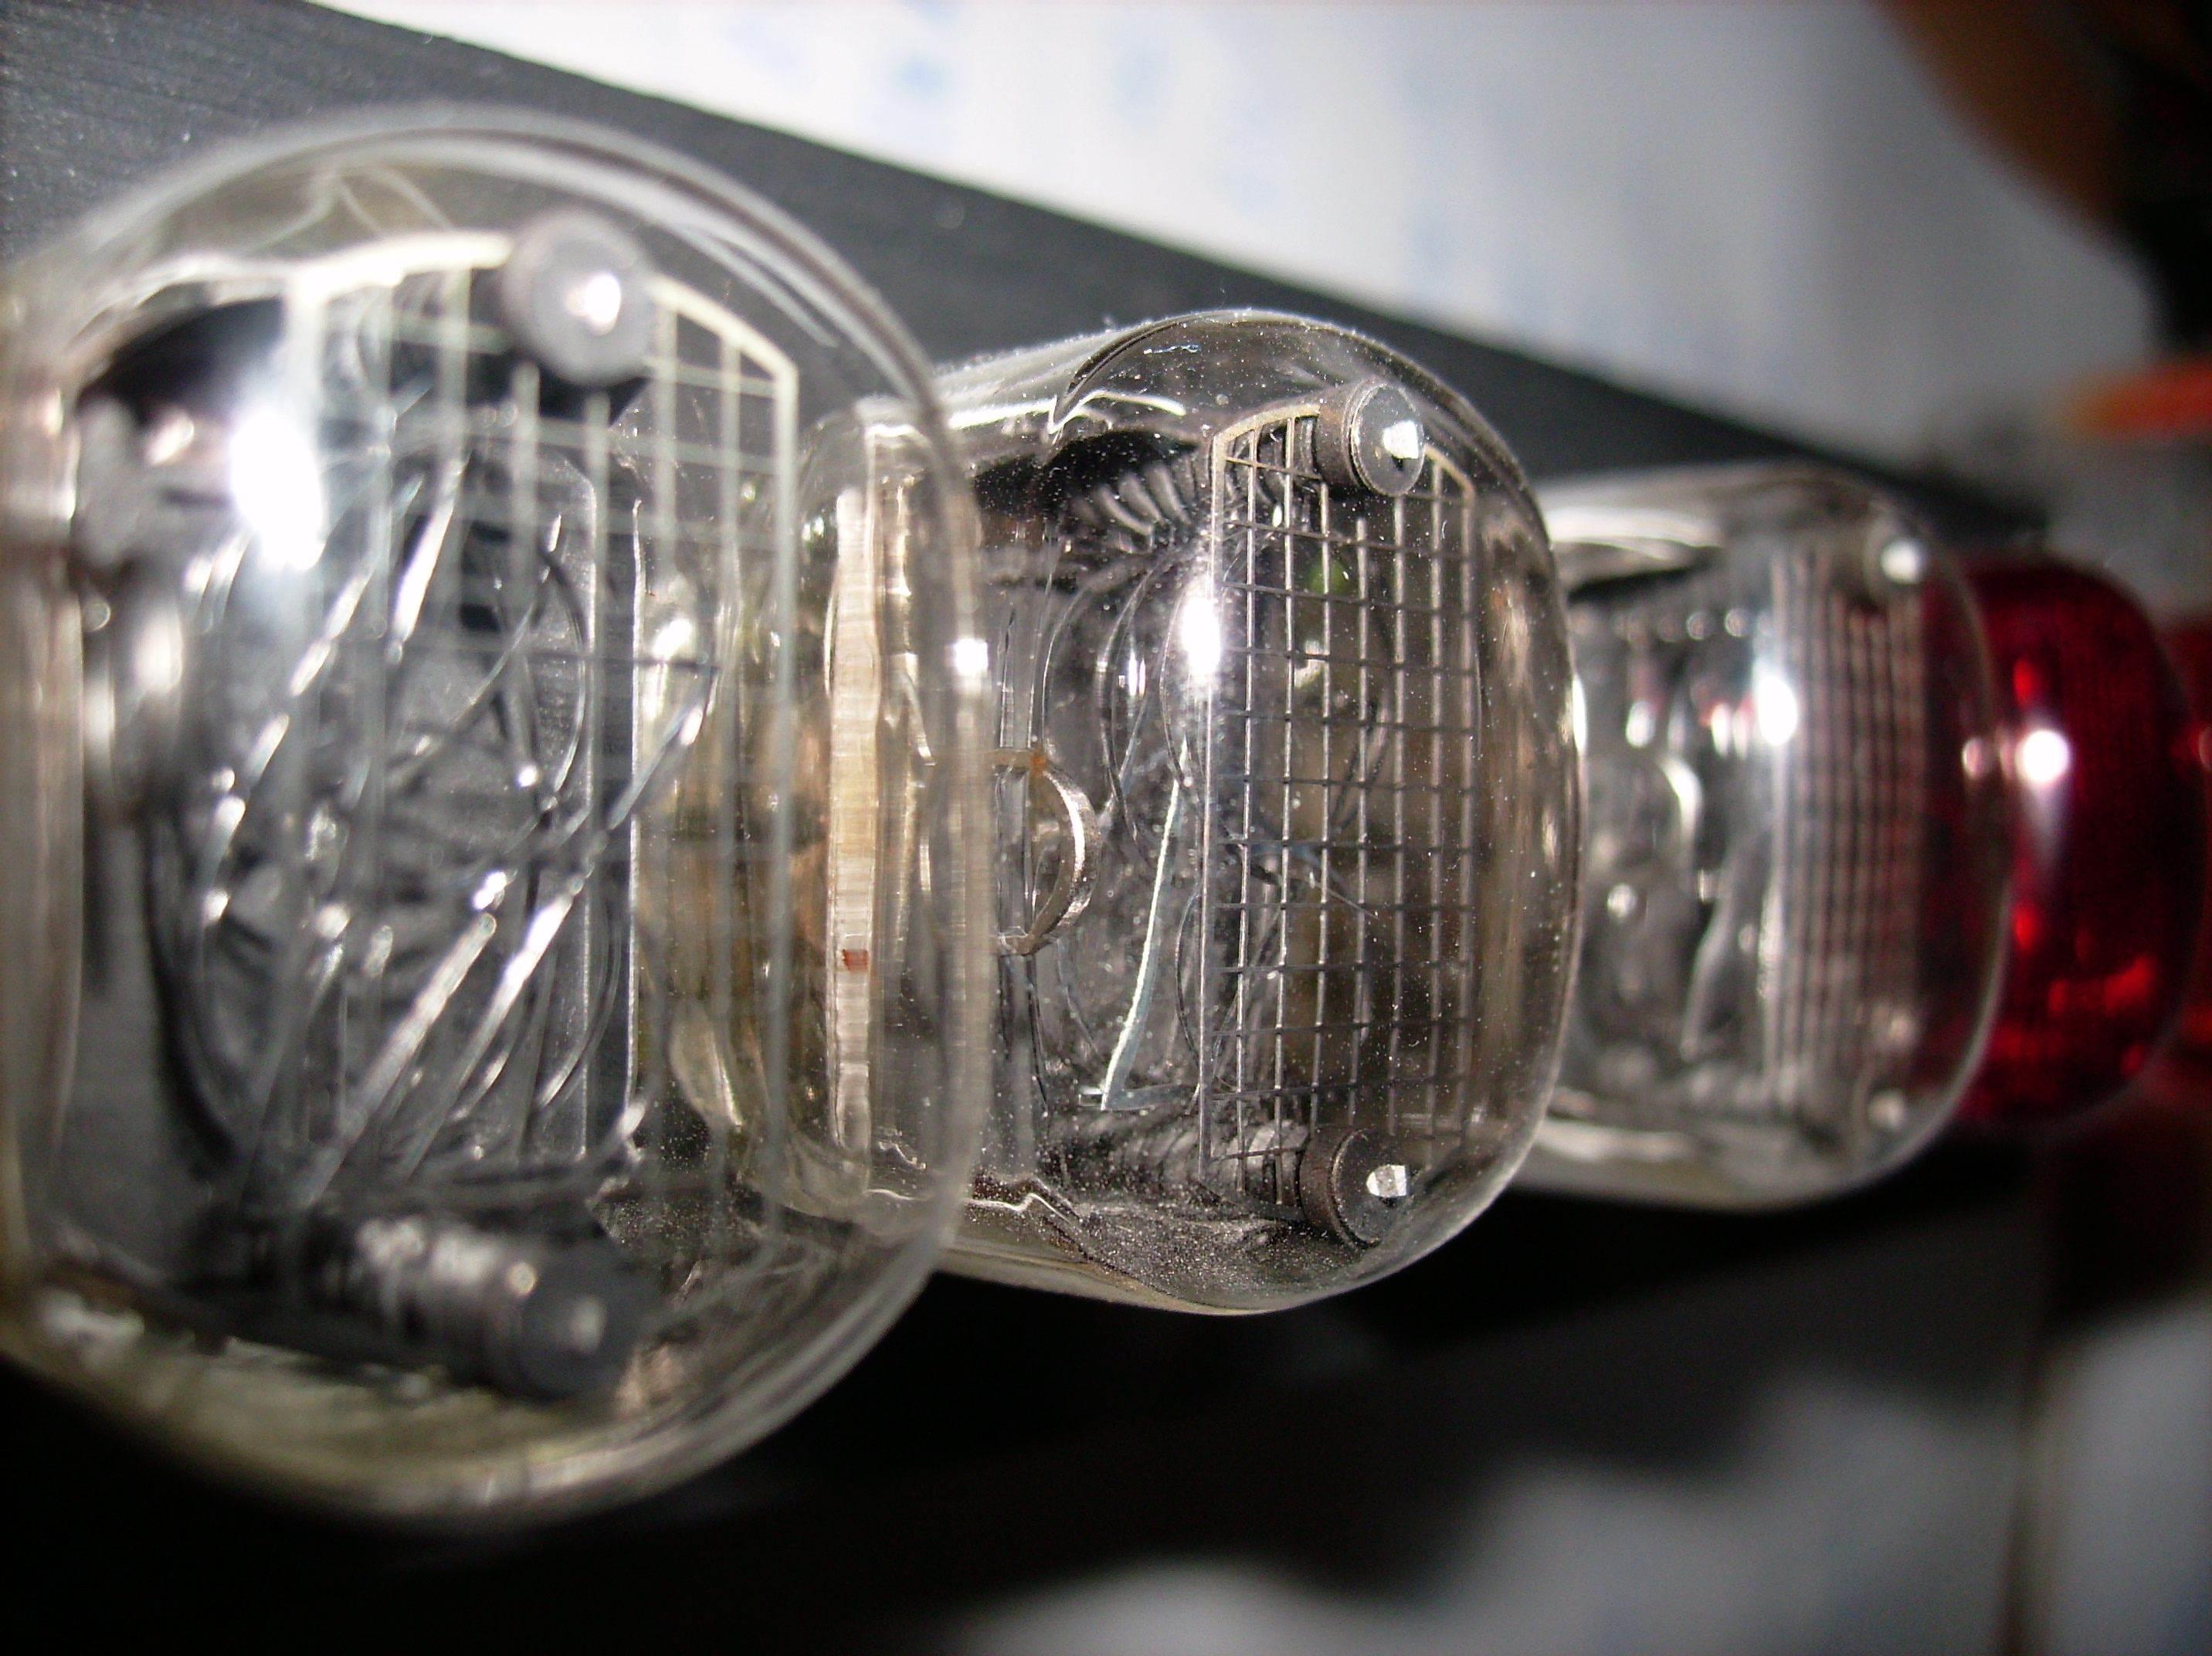 Elektronik Fotos Add Beautiful Car Brake Lights By Bc327 Preview Image For Dsci0135 1